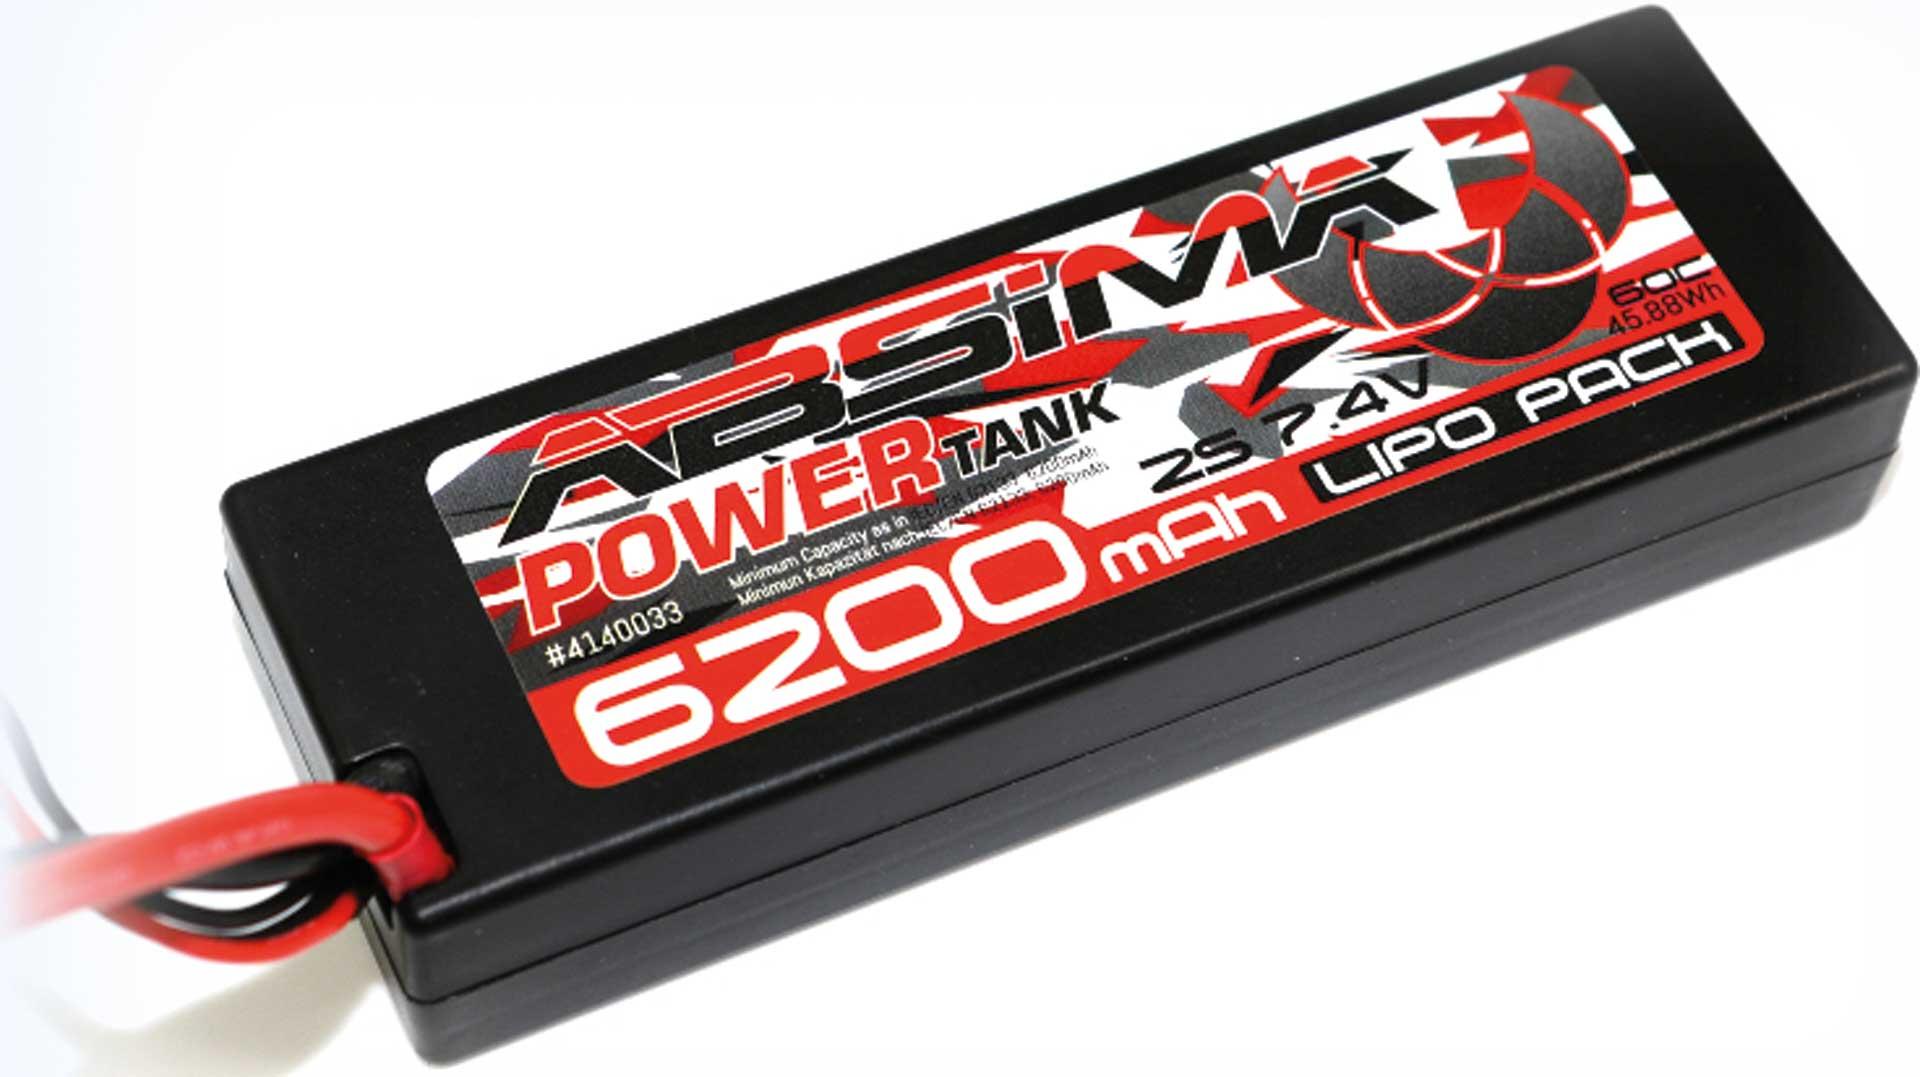 Absima Power Tank LiPo Stick Pack 7.4V-60C6200 Hardcase (XT90-Plug)